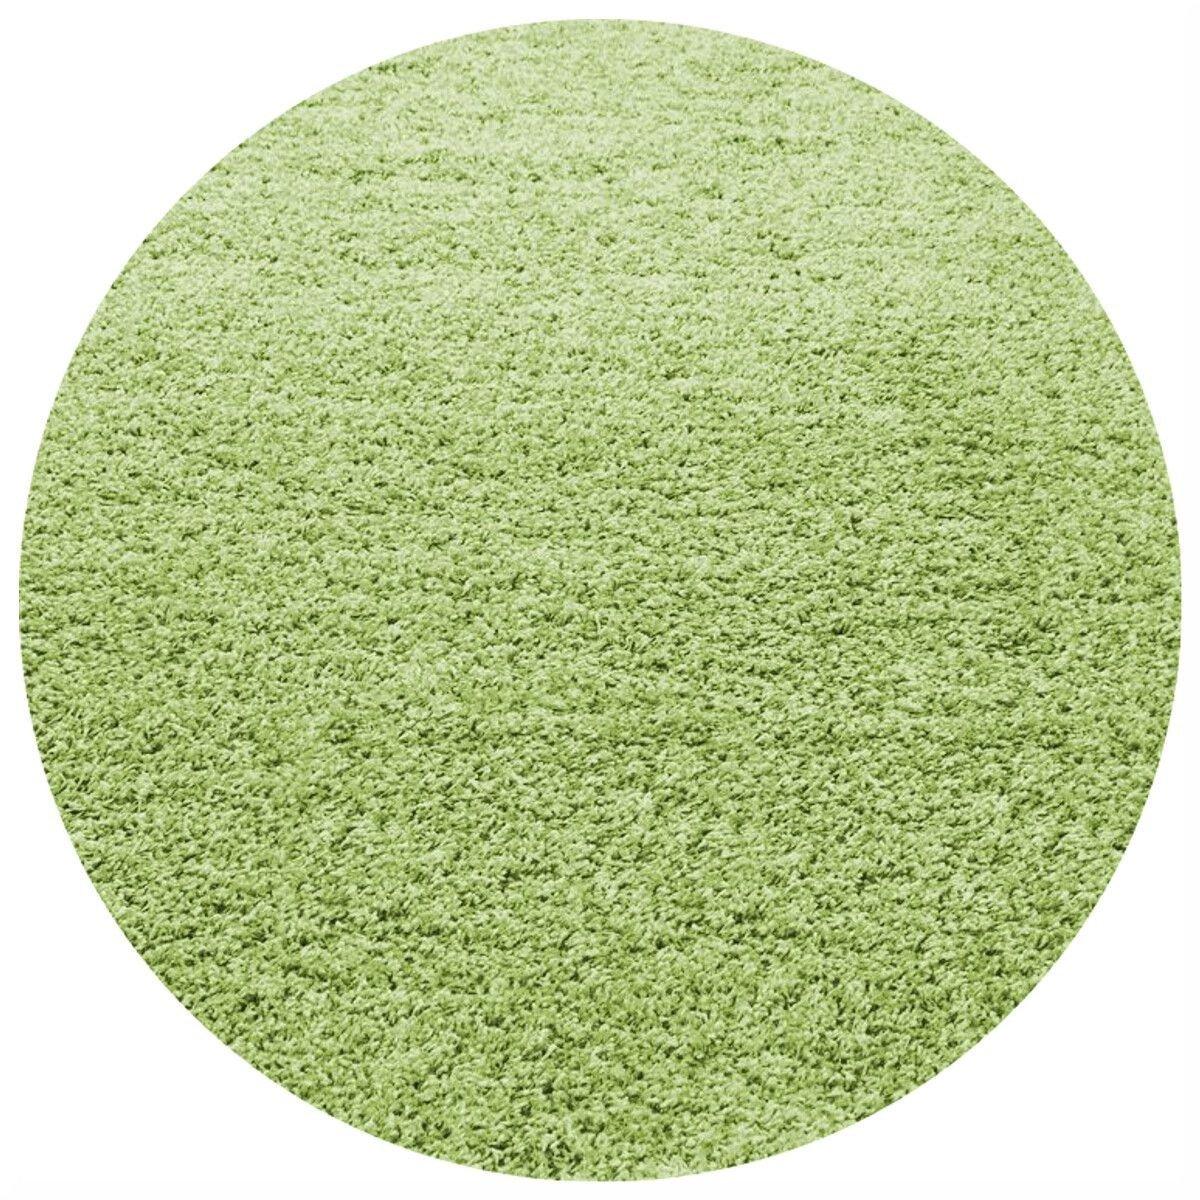 Covor cu fir lung Shaggy Baldur, Rotund, Verde 80x80